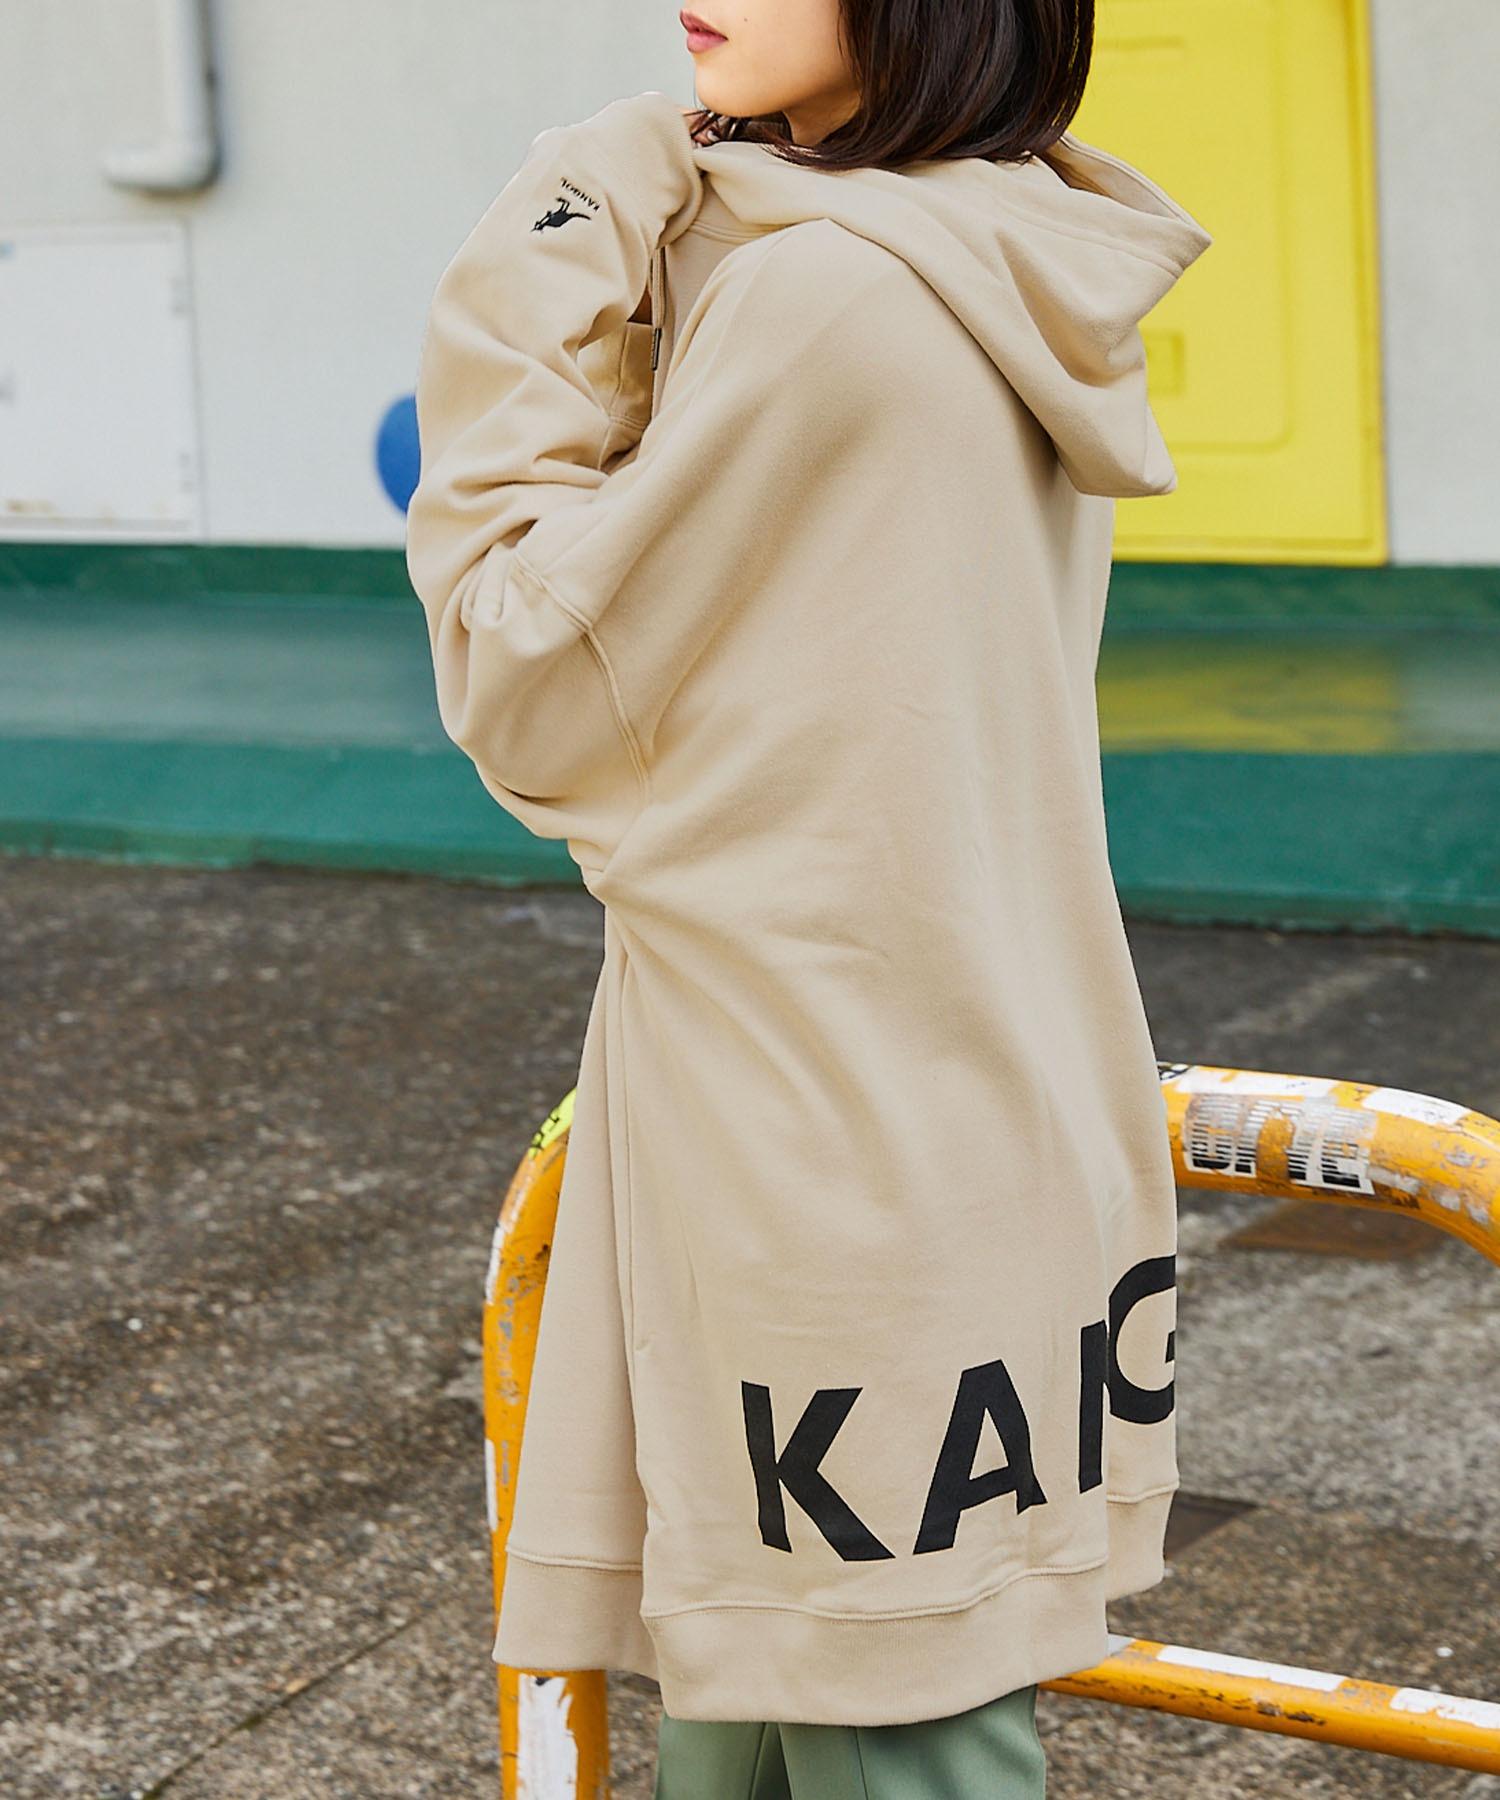 【BASQUE -enthusiastic design-】KANGOL カンゴール BASQUE magenta 別注 バックプリント スーパービッグシルエットプルオーバーパーカー